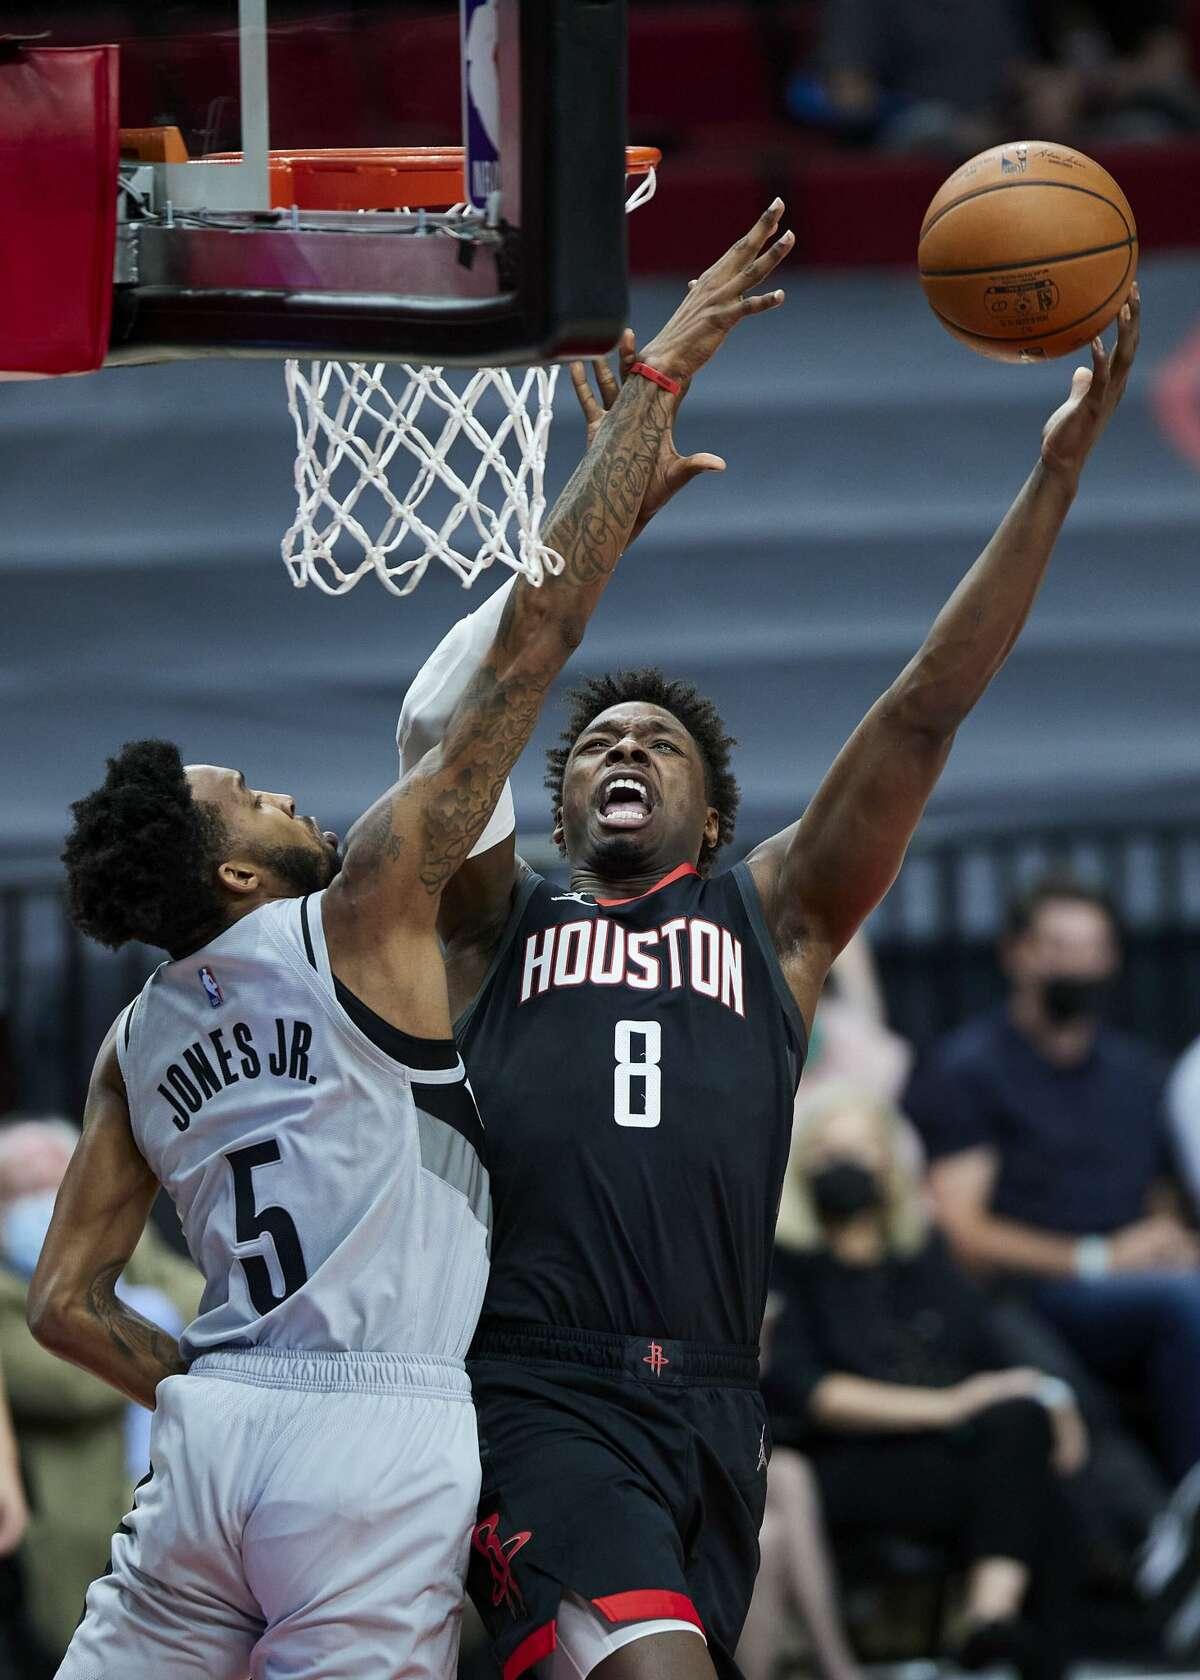 Houston Rockets forward Jae'Sean Tate, right, shoots over Portland Trail Blazers forward Derrick Jones Jr. during the first half of an NBA basketball game in Portland, Ore., Monday, May 10, 2021. (AP Photo/Craig Mitchelldyer)